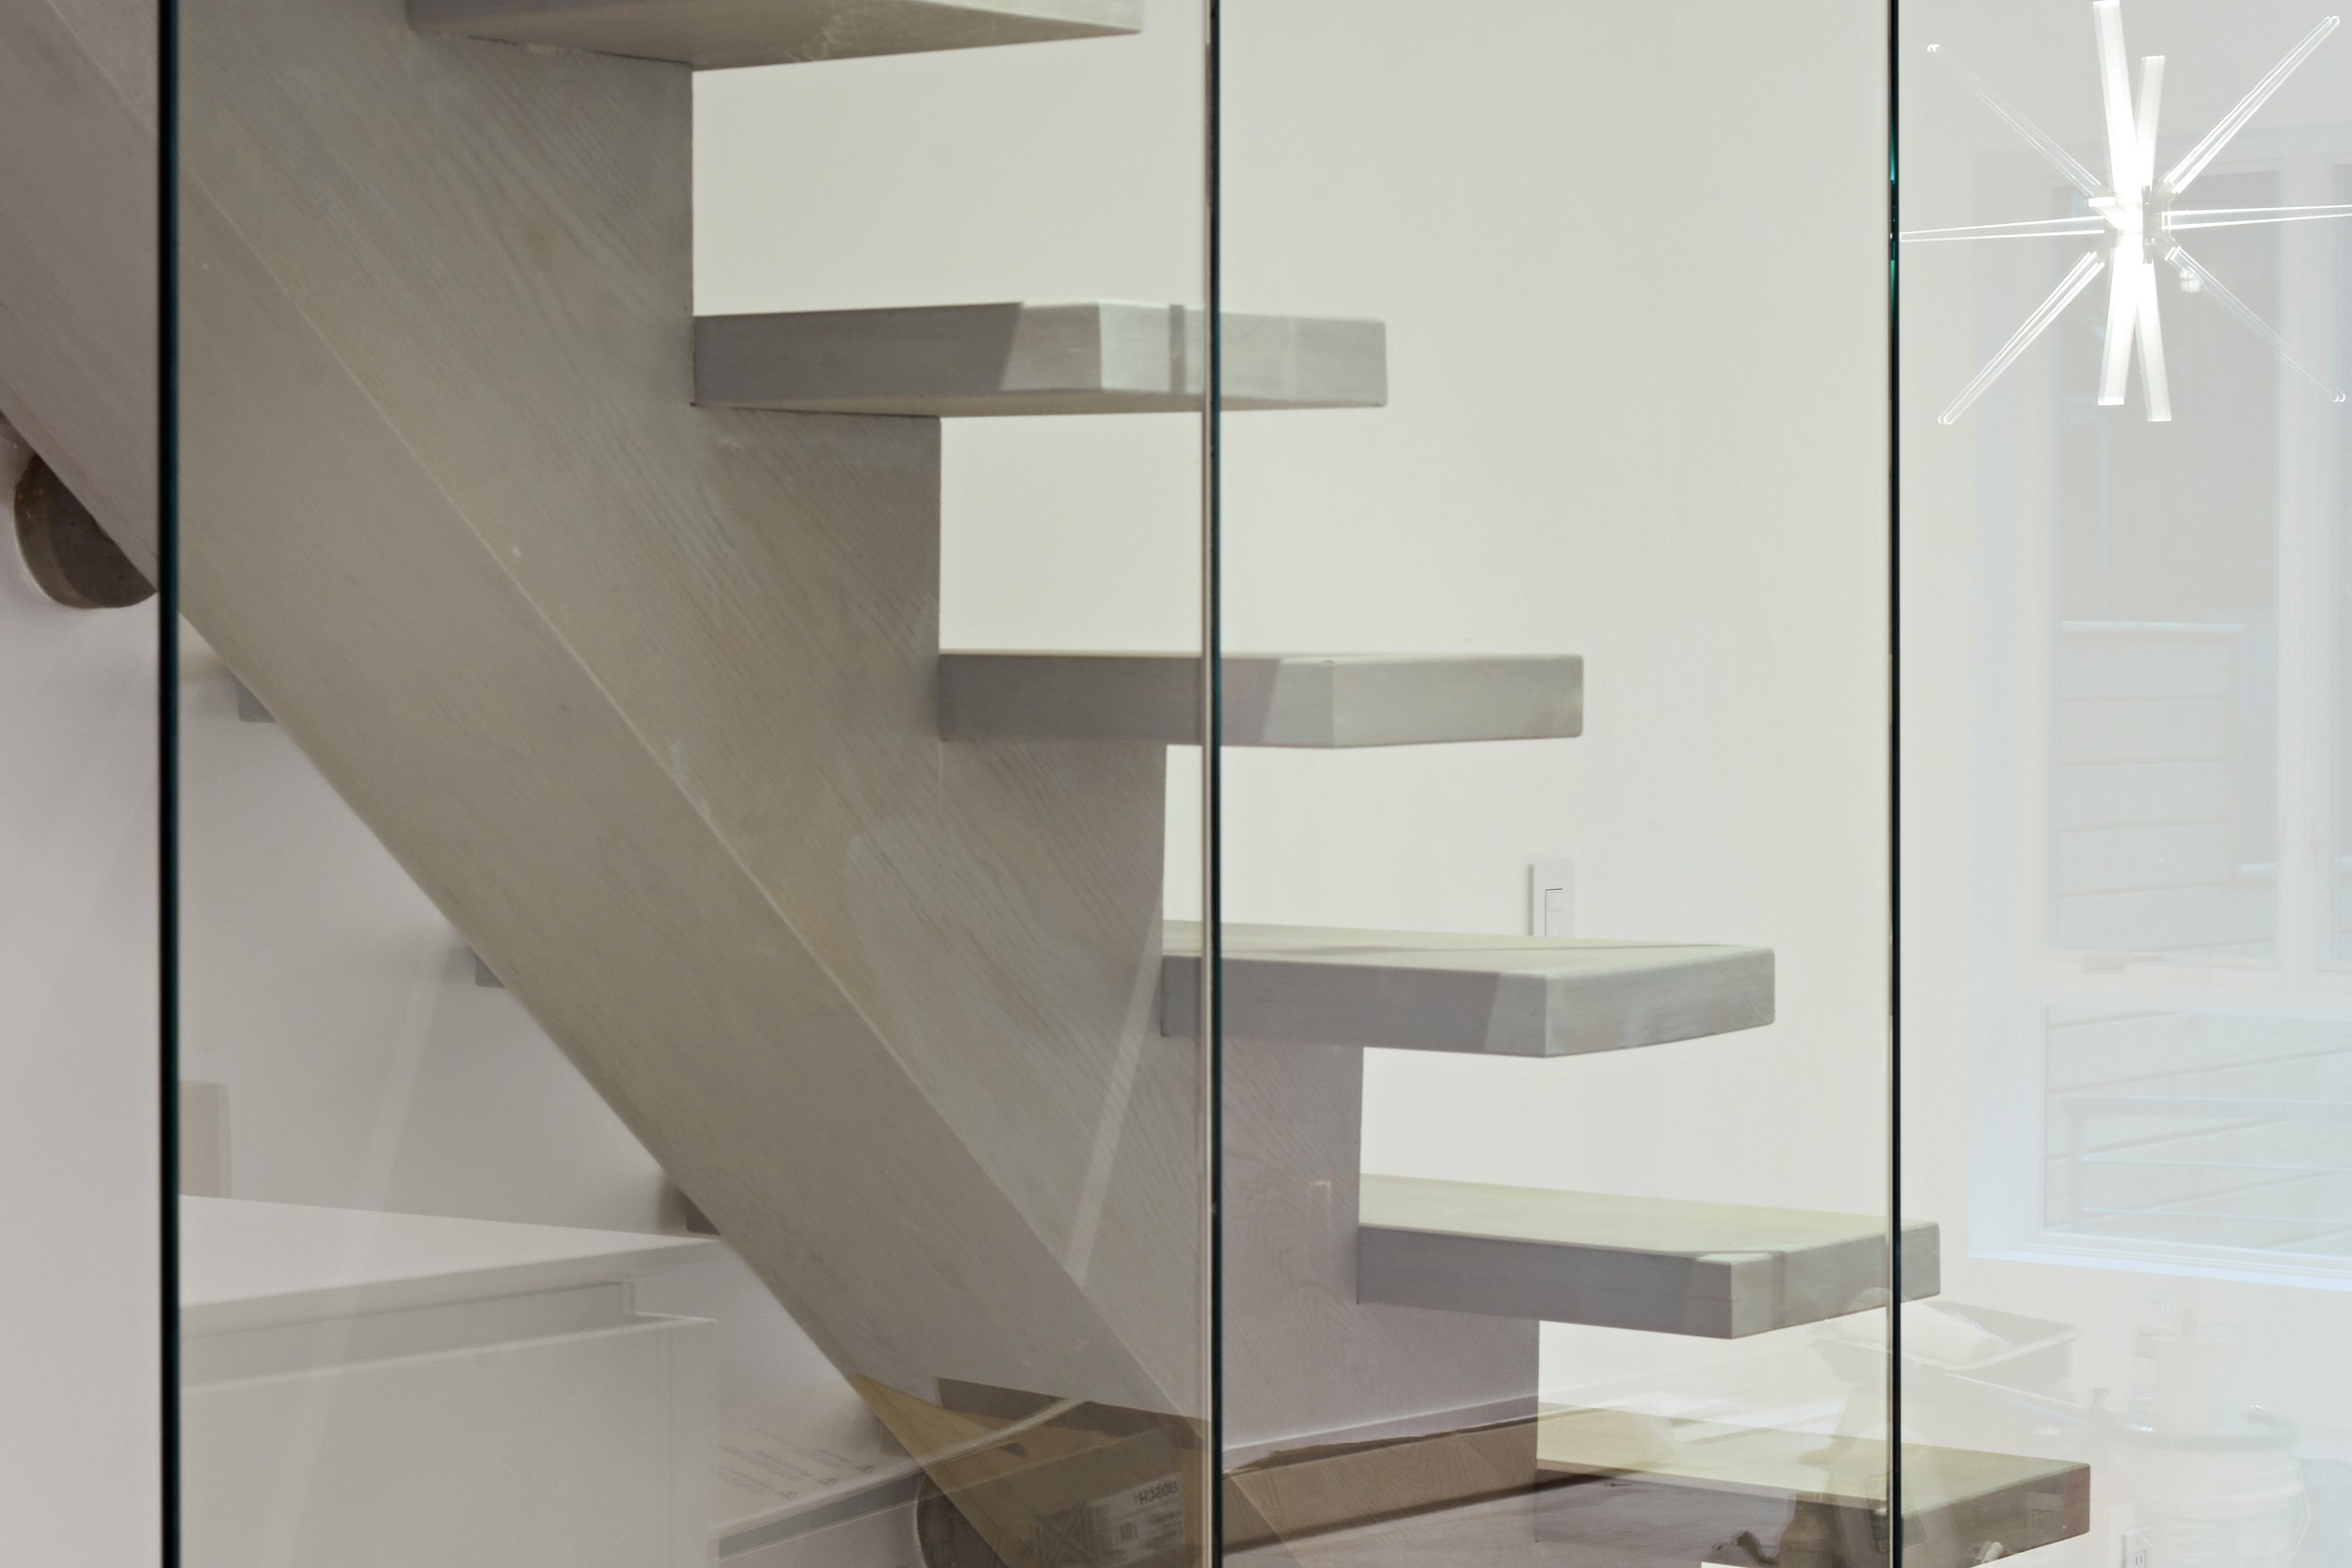 06_22SAINTFELIXSt_68_Staircase_HiRes.jpg